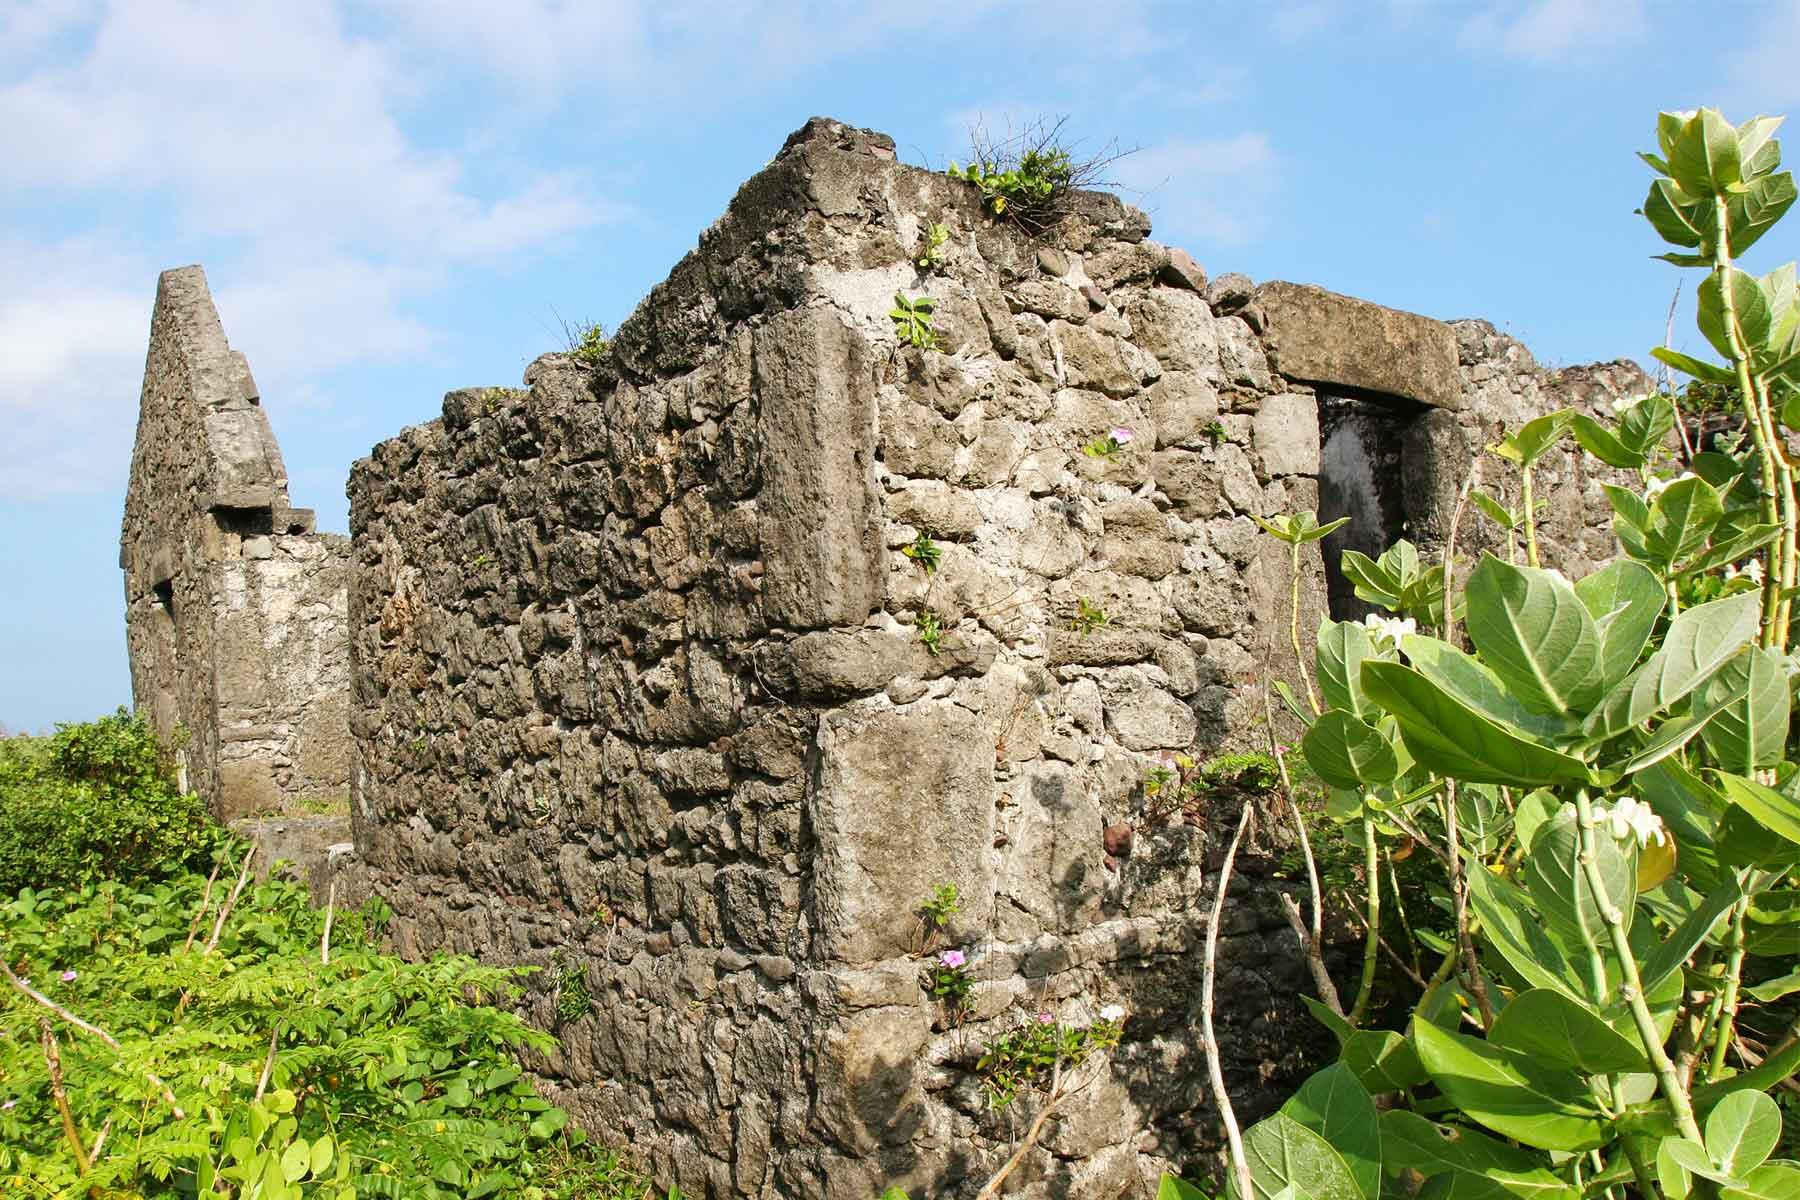 Limestone houses - Batan Island Philippines - Dr Steven Andrew Martin - Archaeology